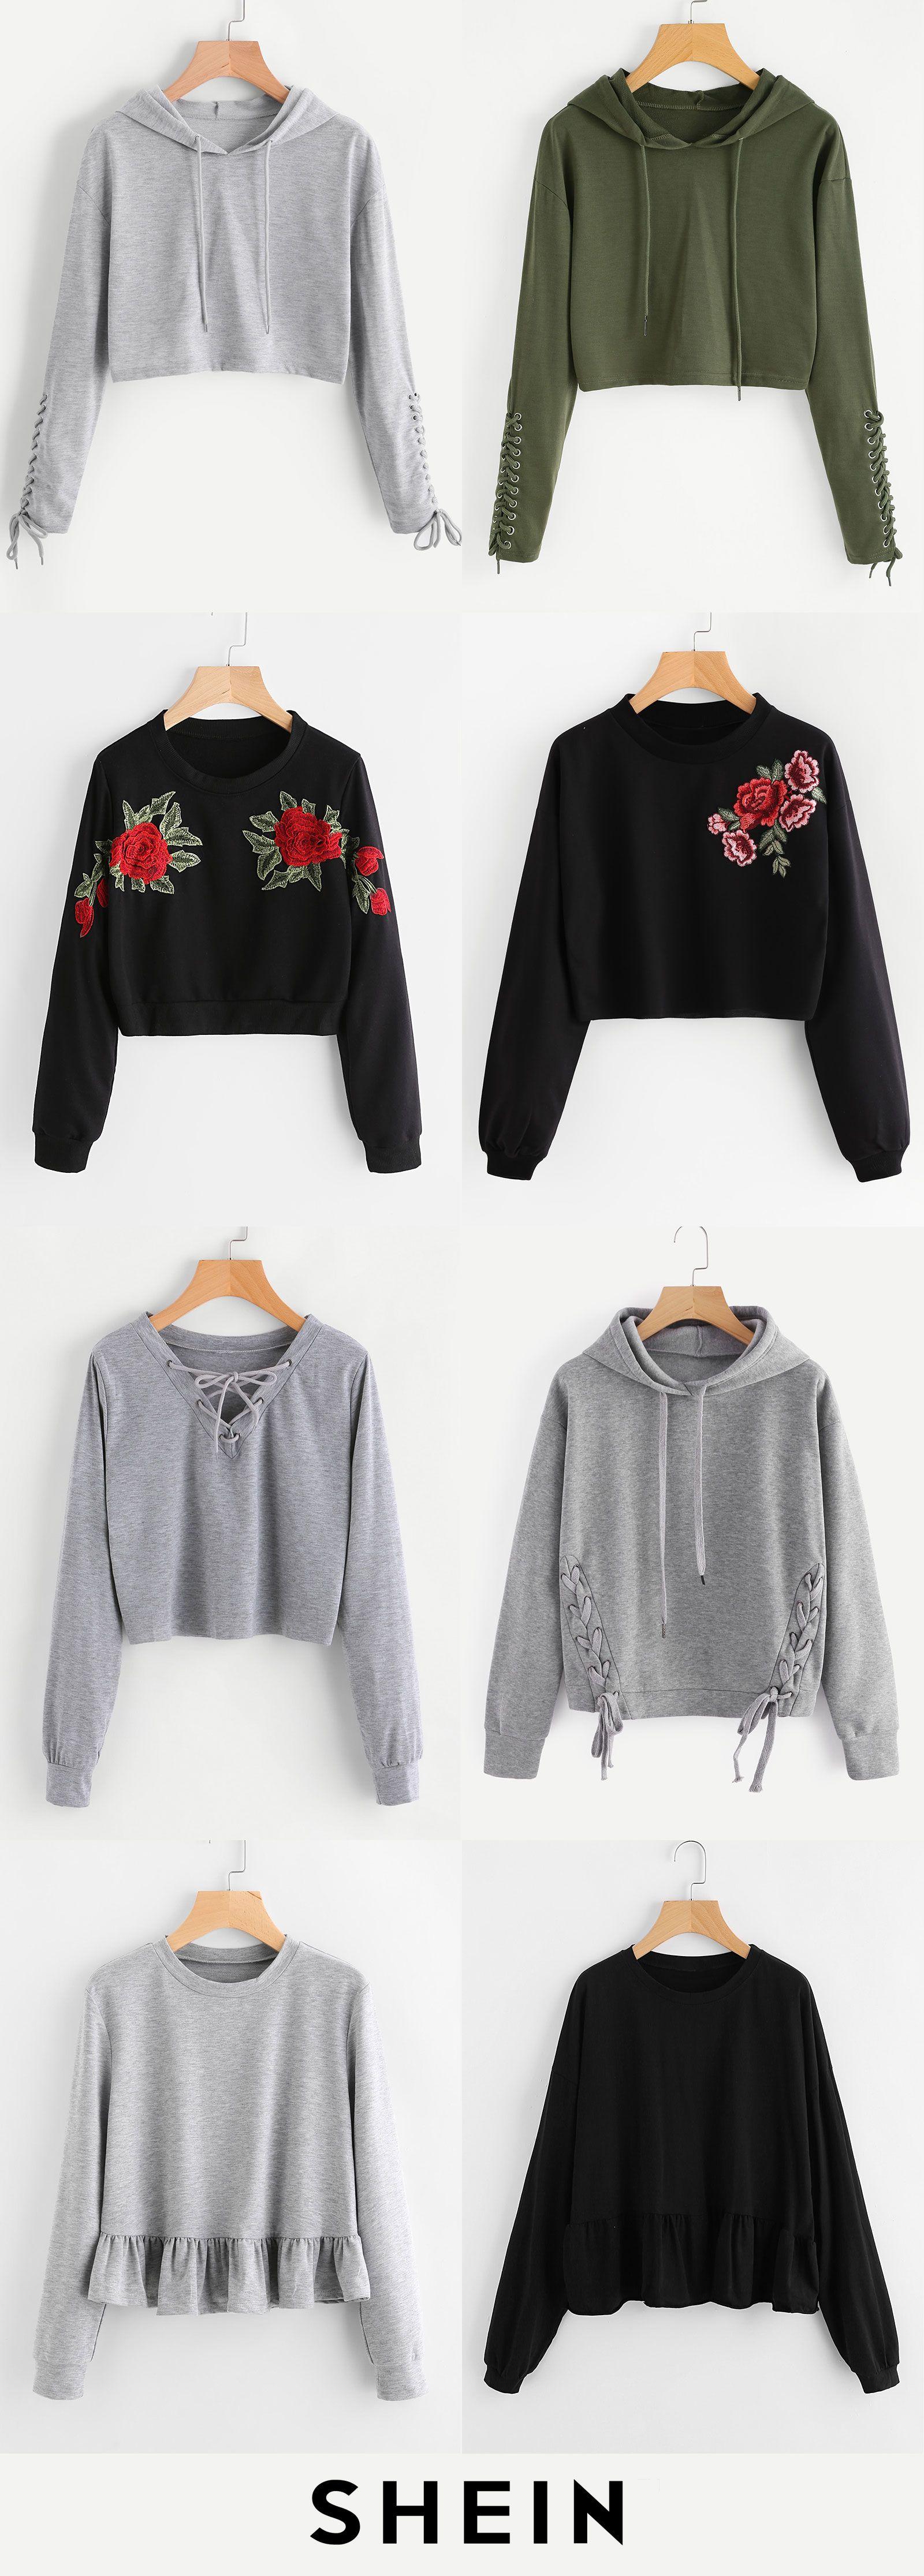 Sweatshirt adoration